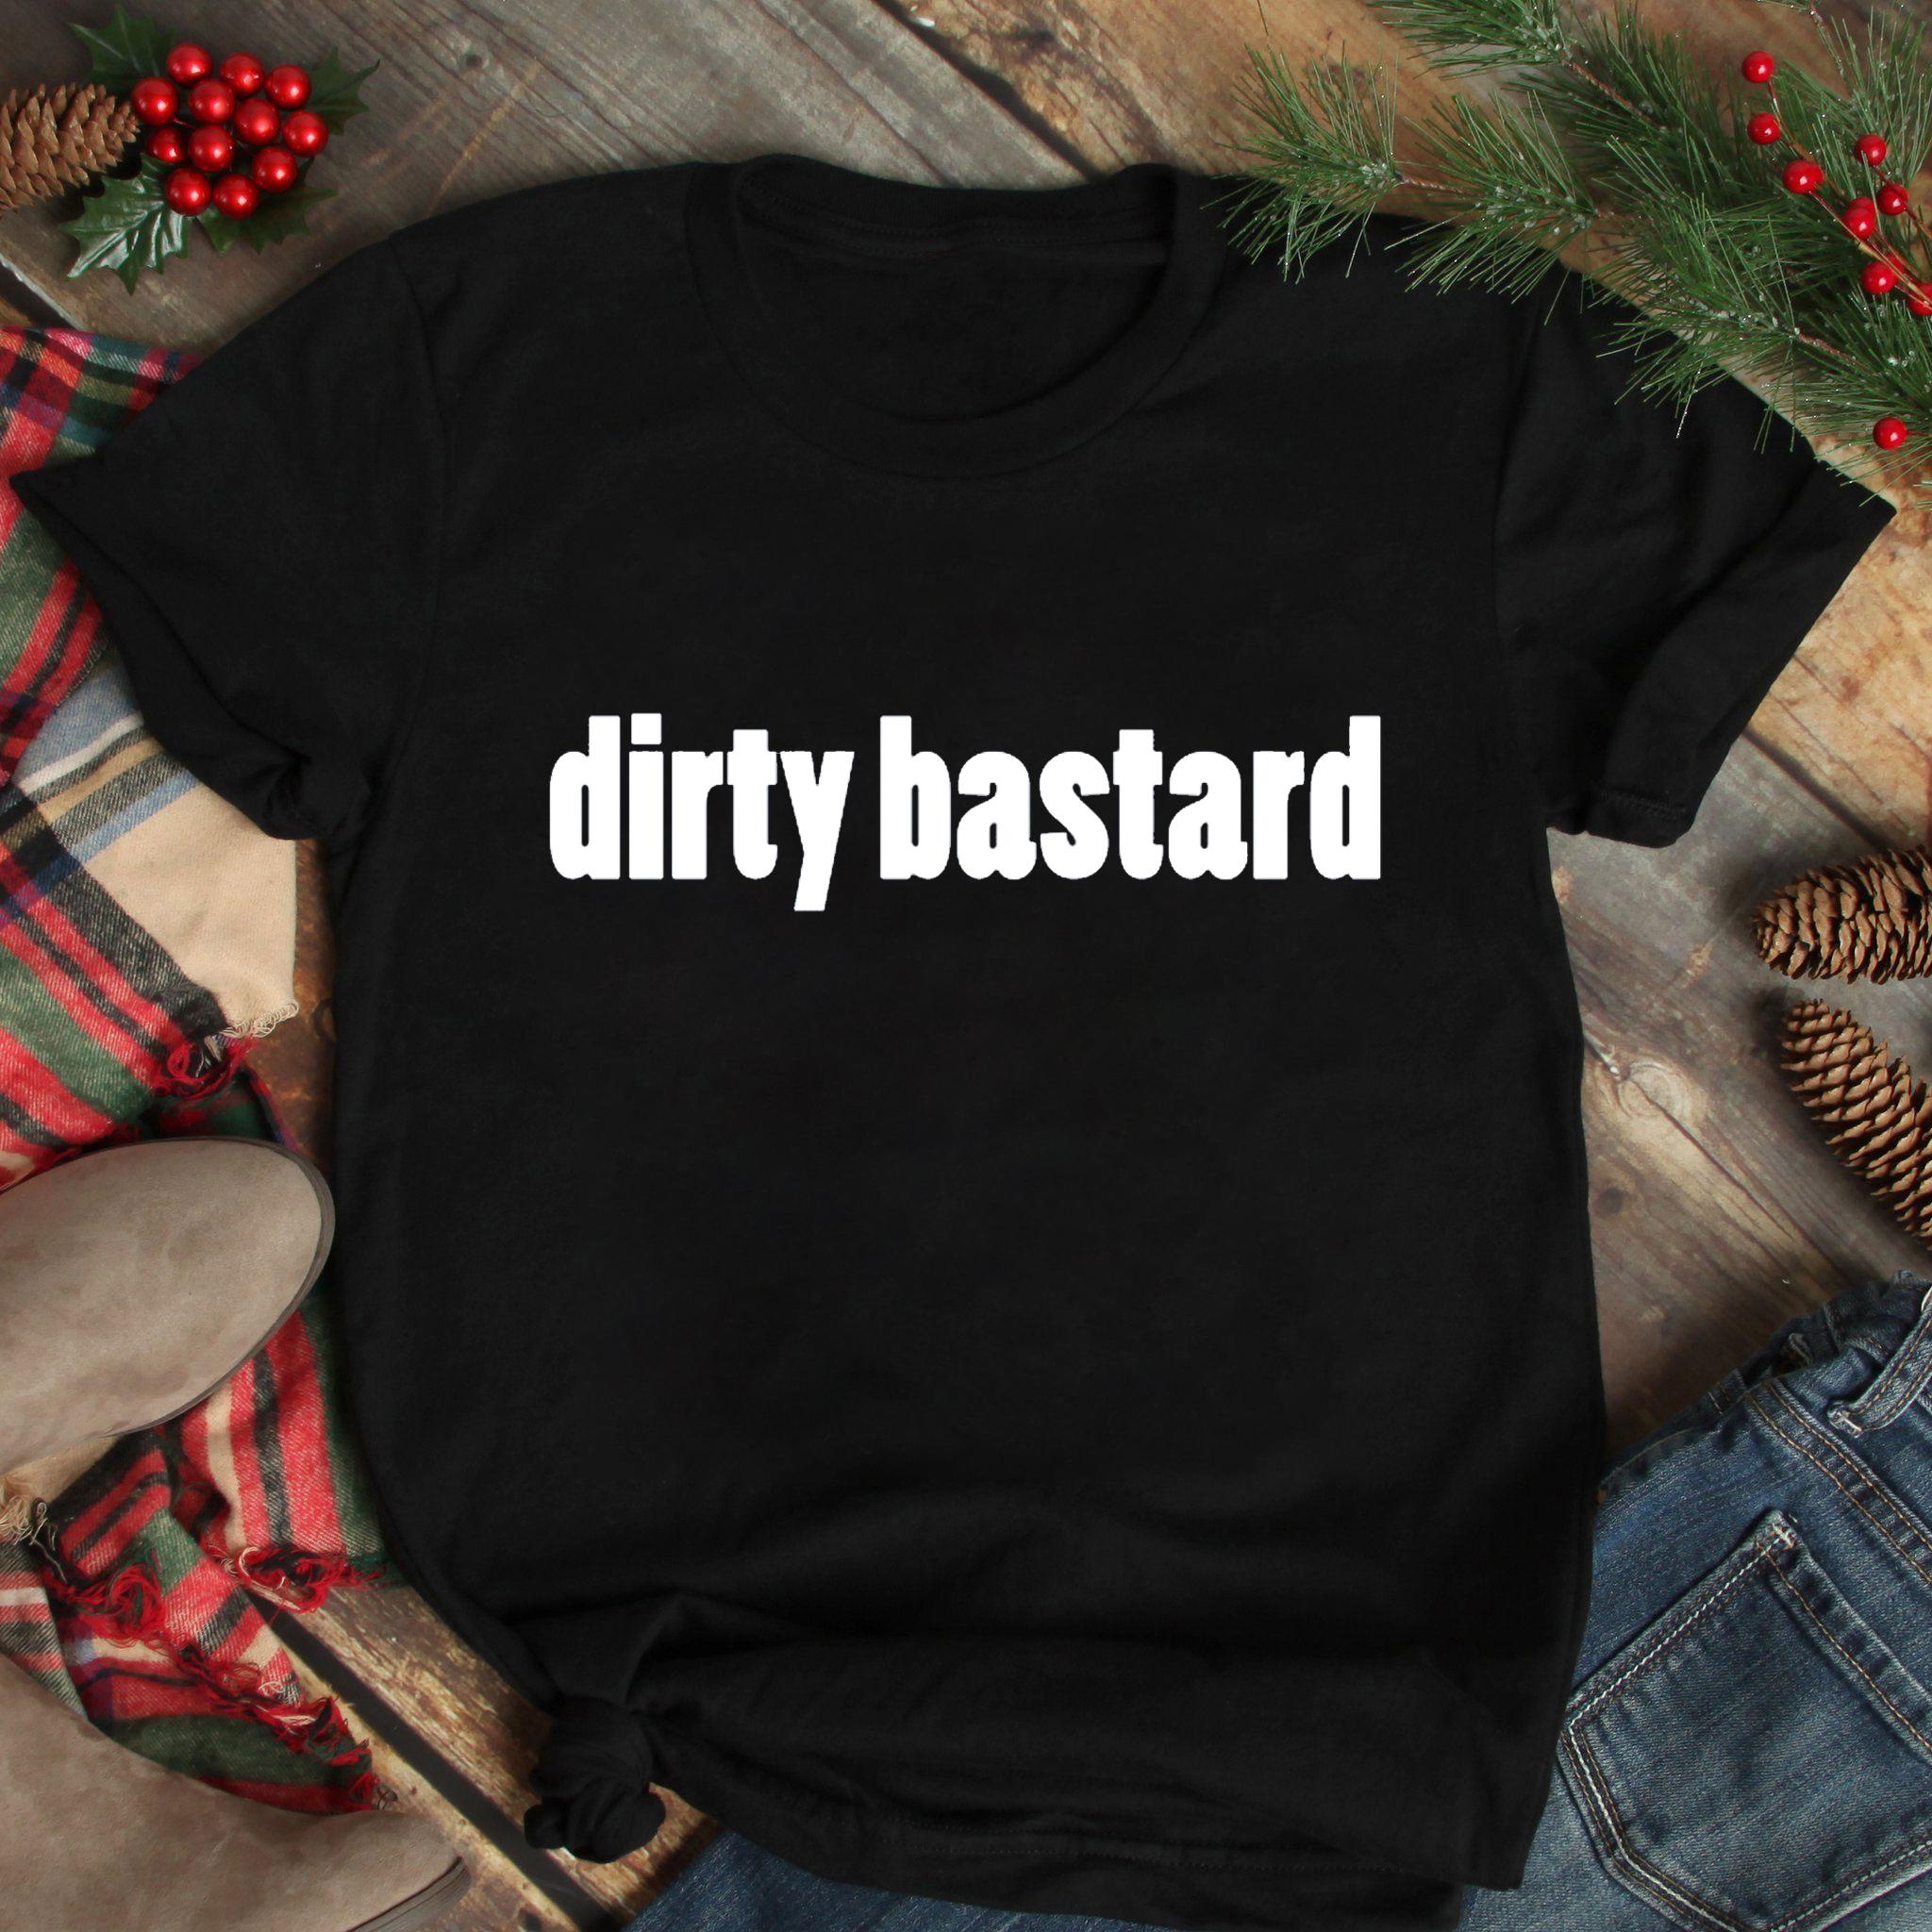 Obscene Lover Shirt Dirty Bastard